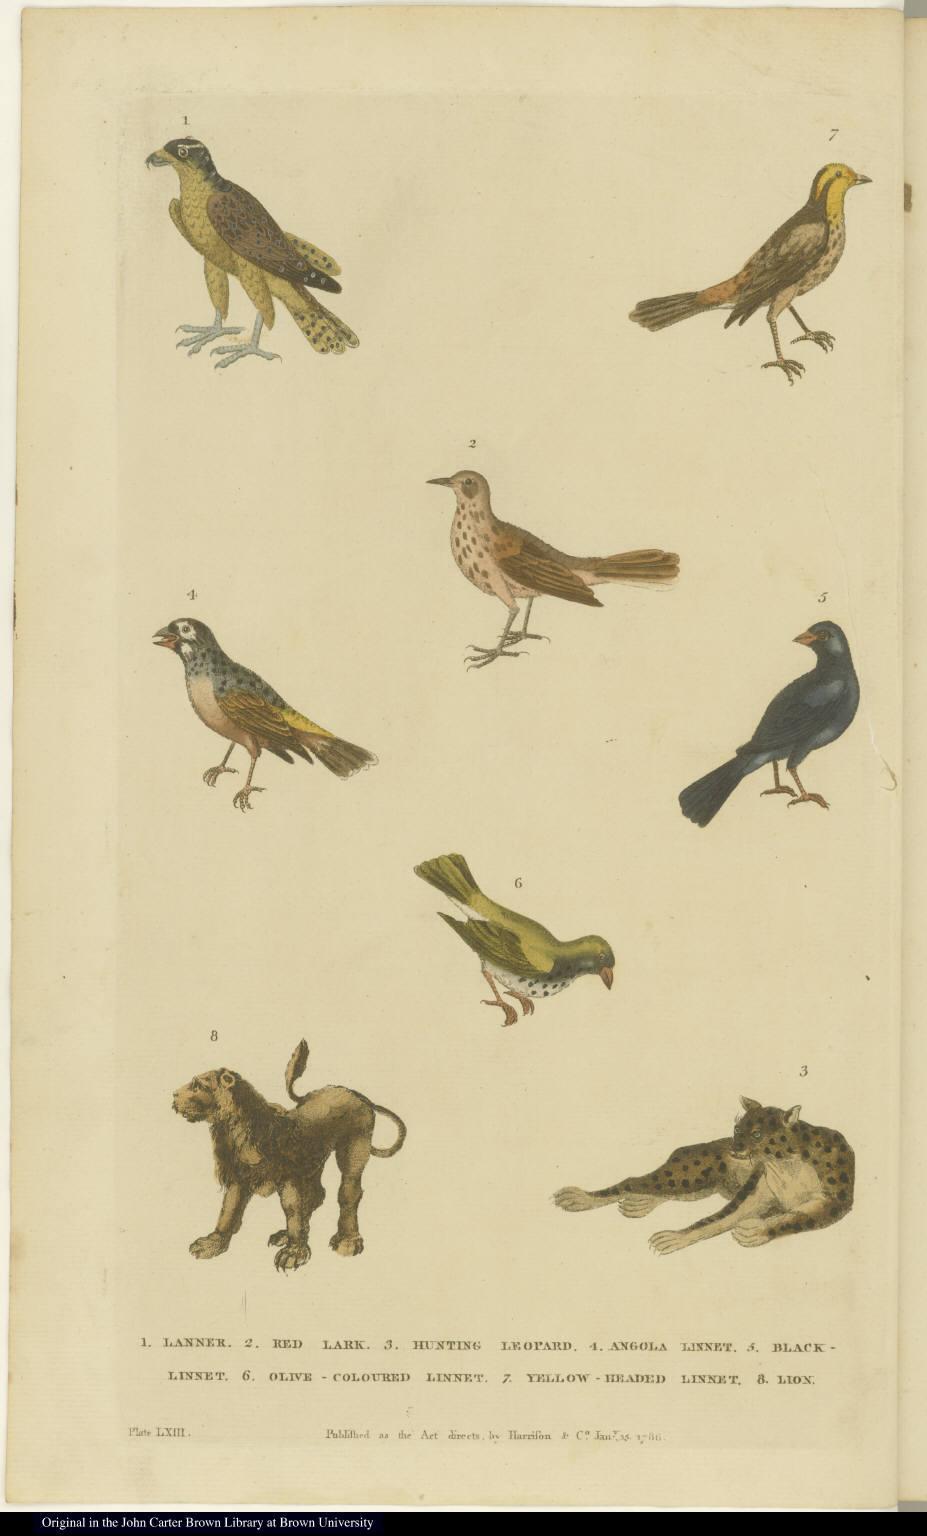 [Birds, lion, and leopard]